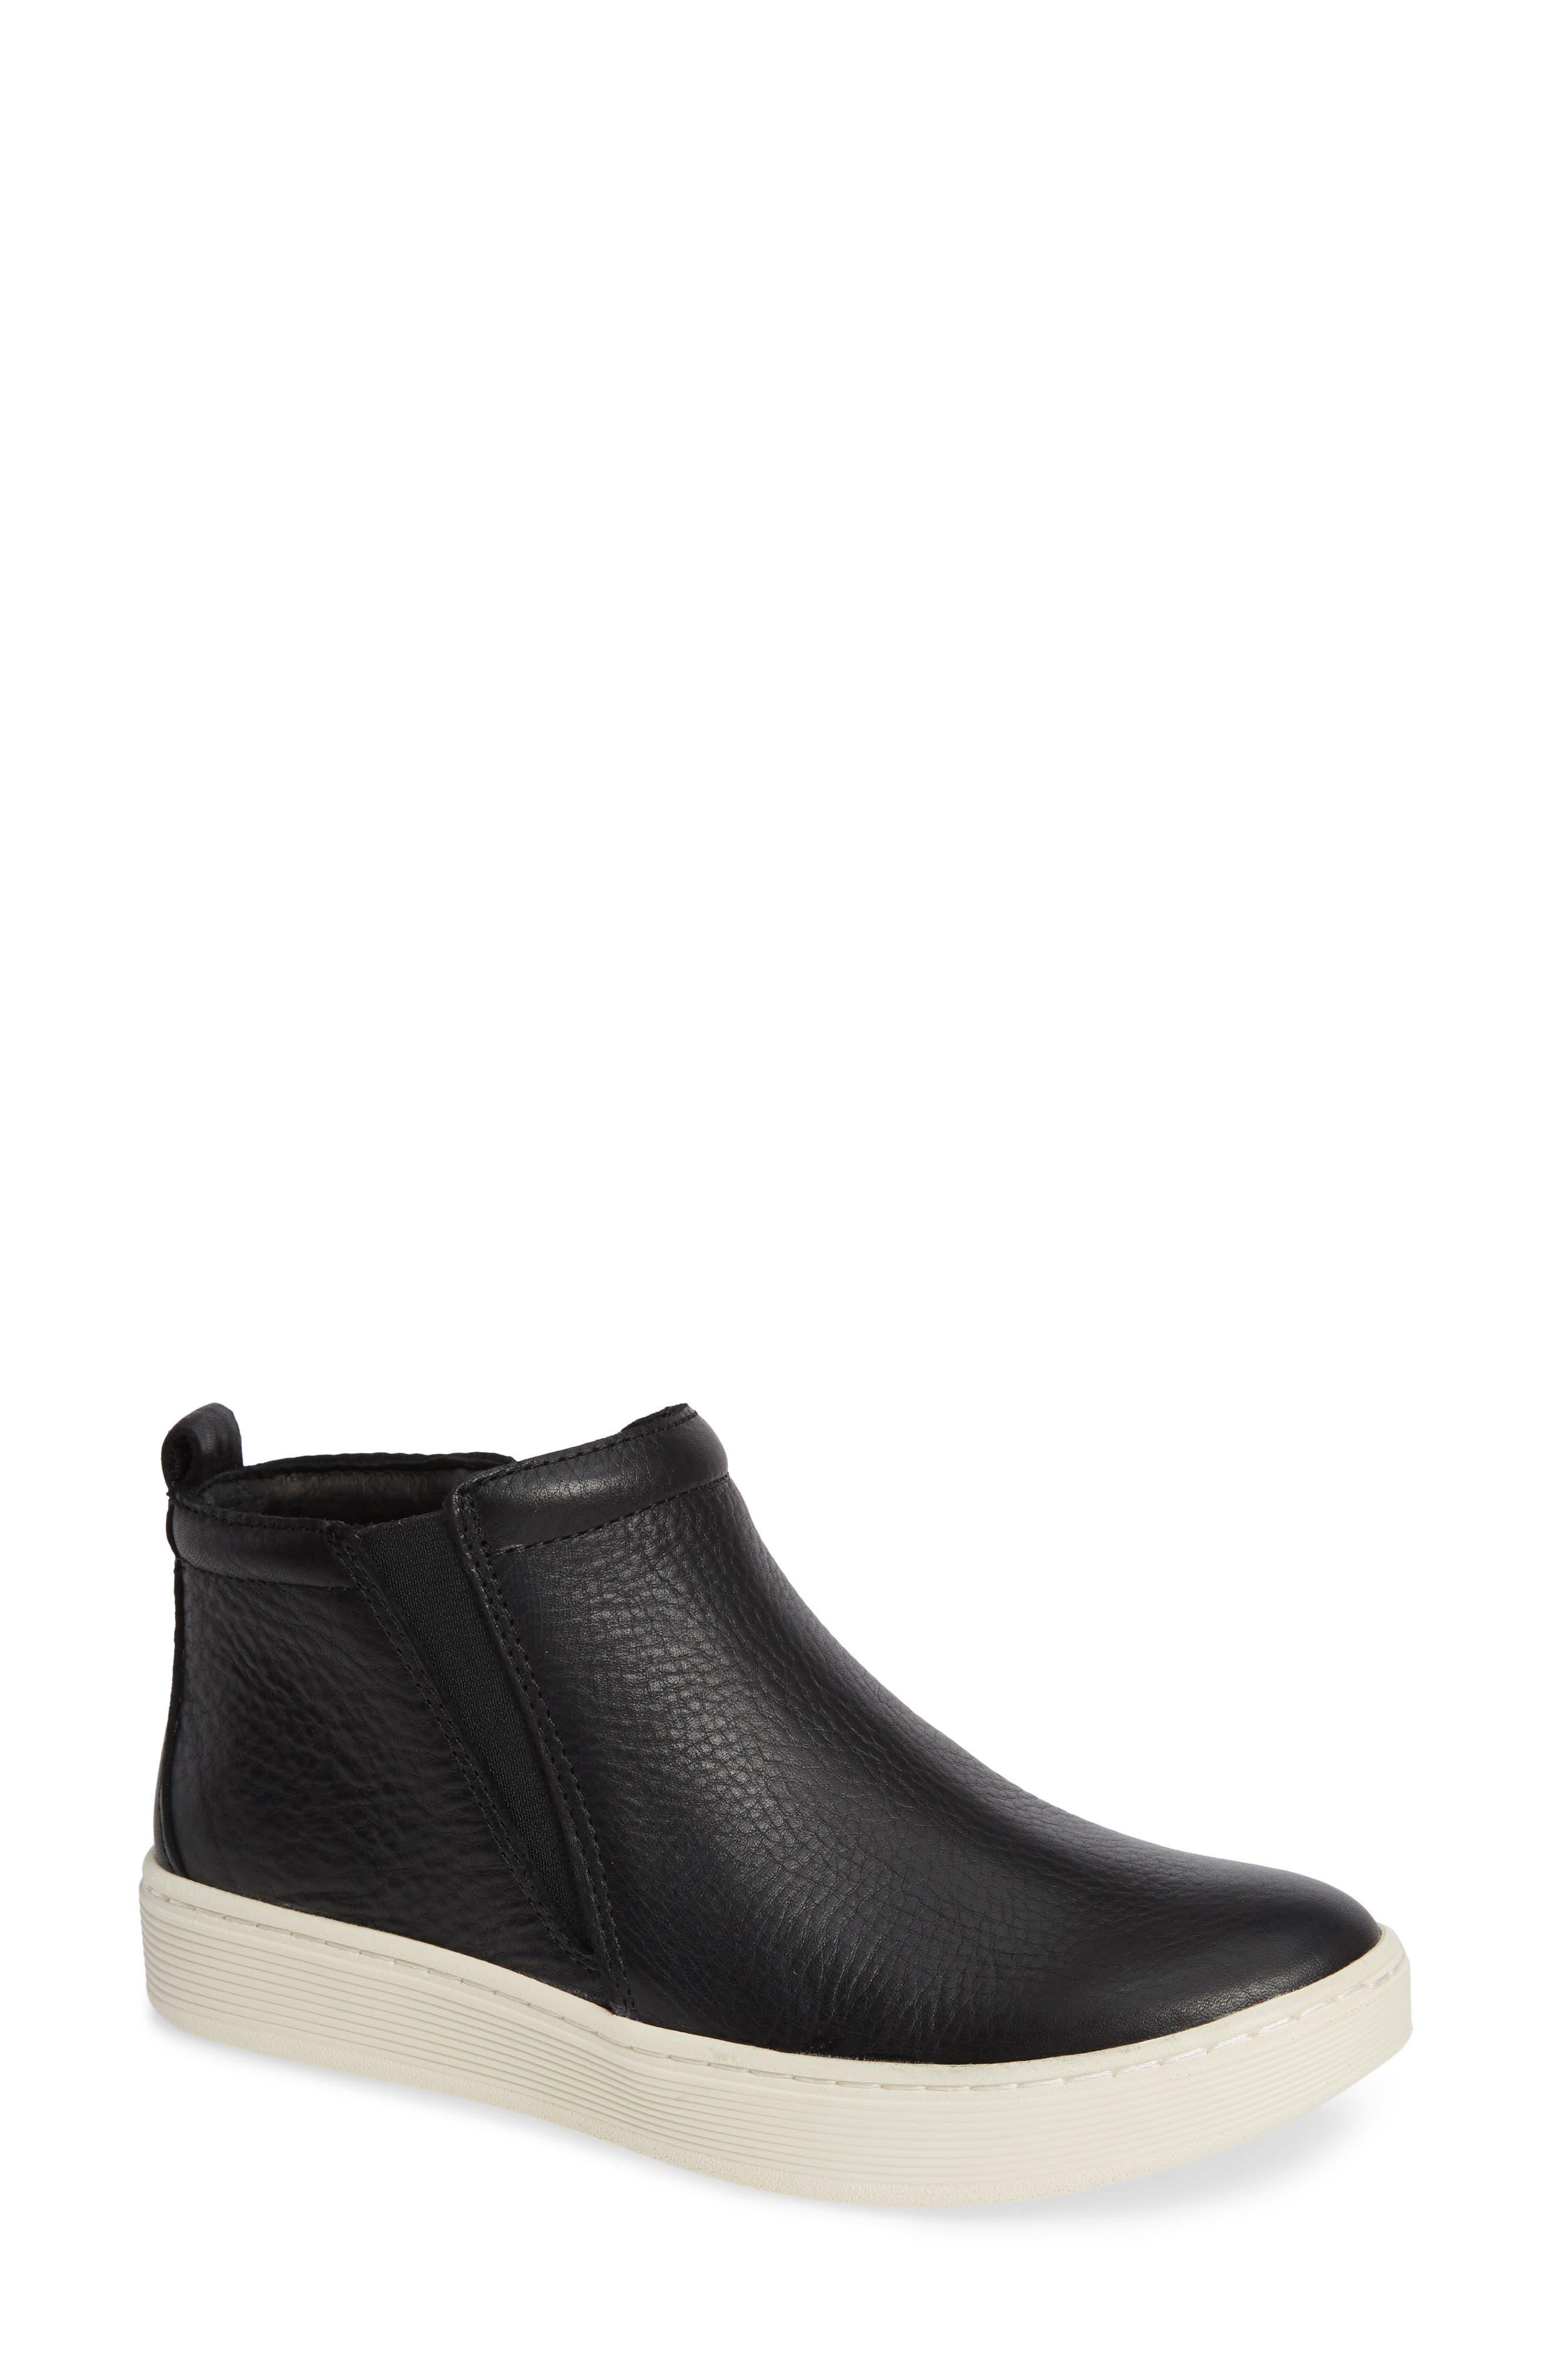 Britton II Waterproof Sneaker Bootie,                         Main,                         color, BLACK LEATHER